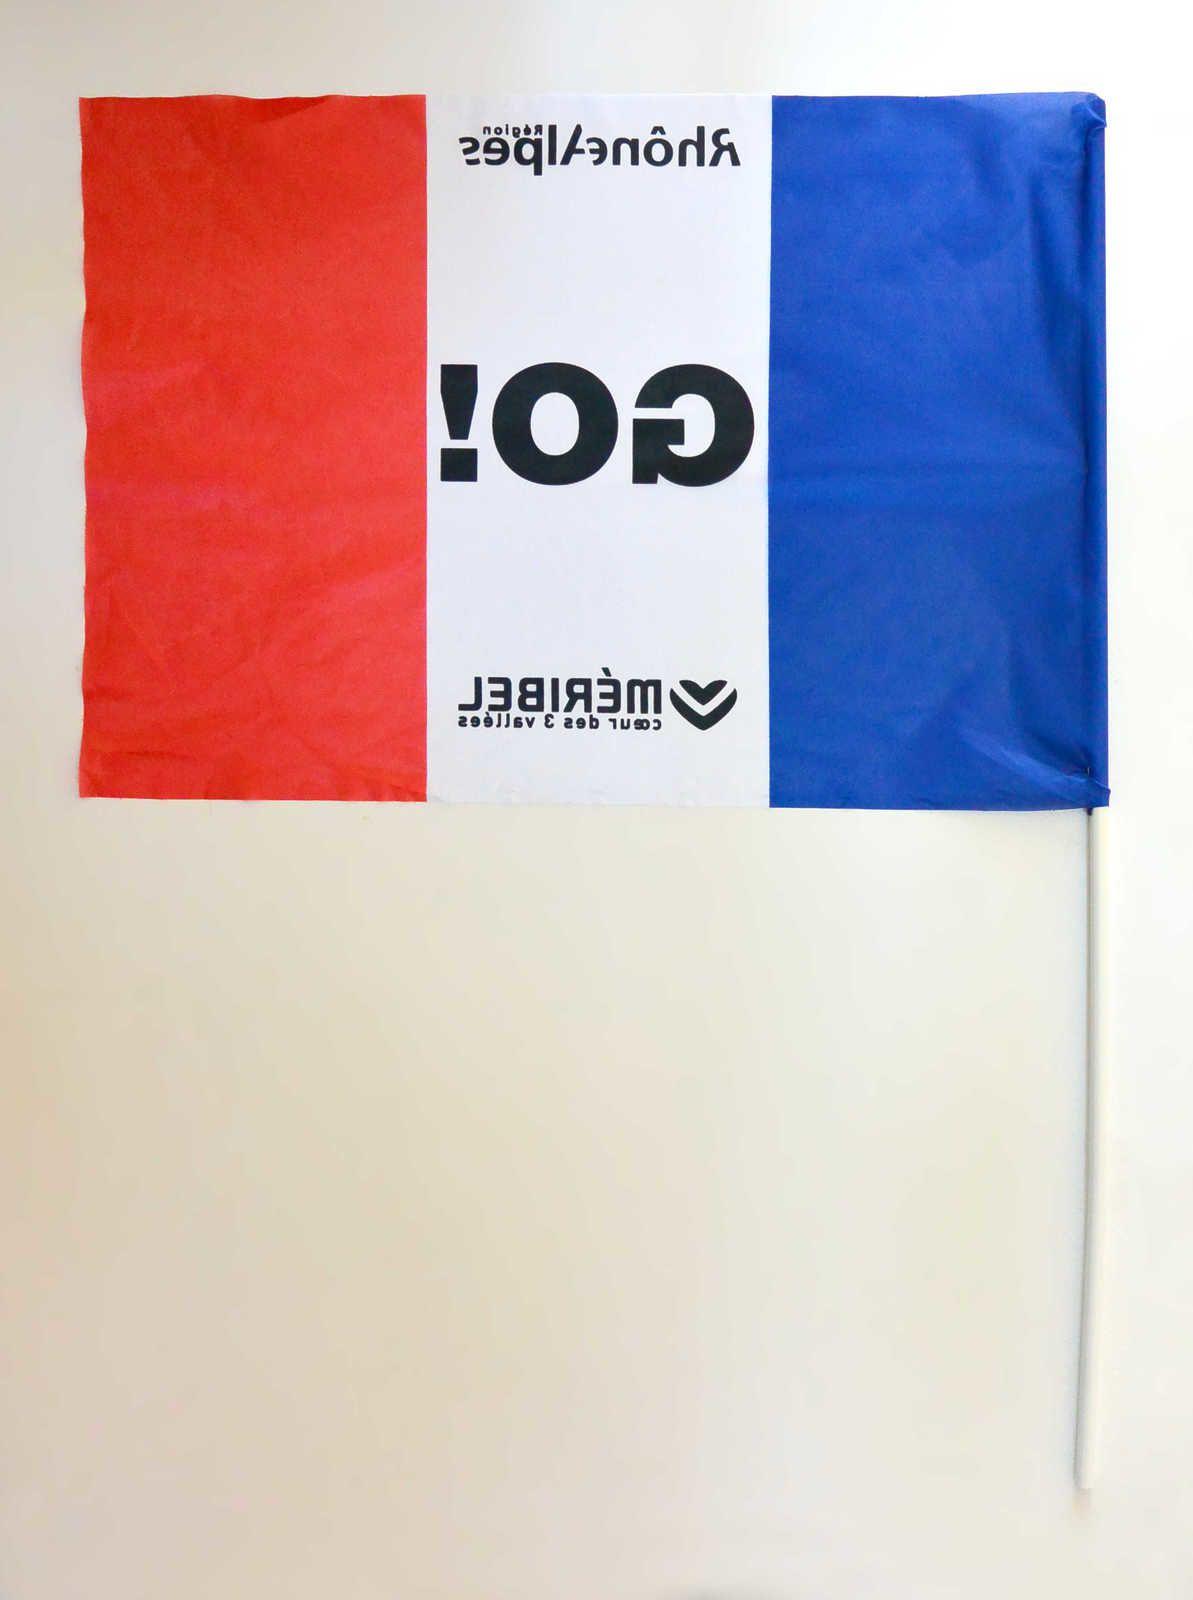 Drapeau France coupe du monde de ski alpin 2015